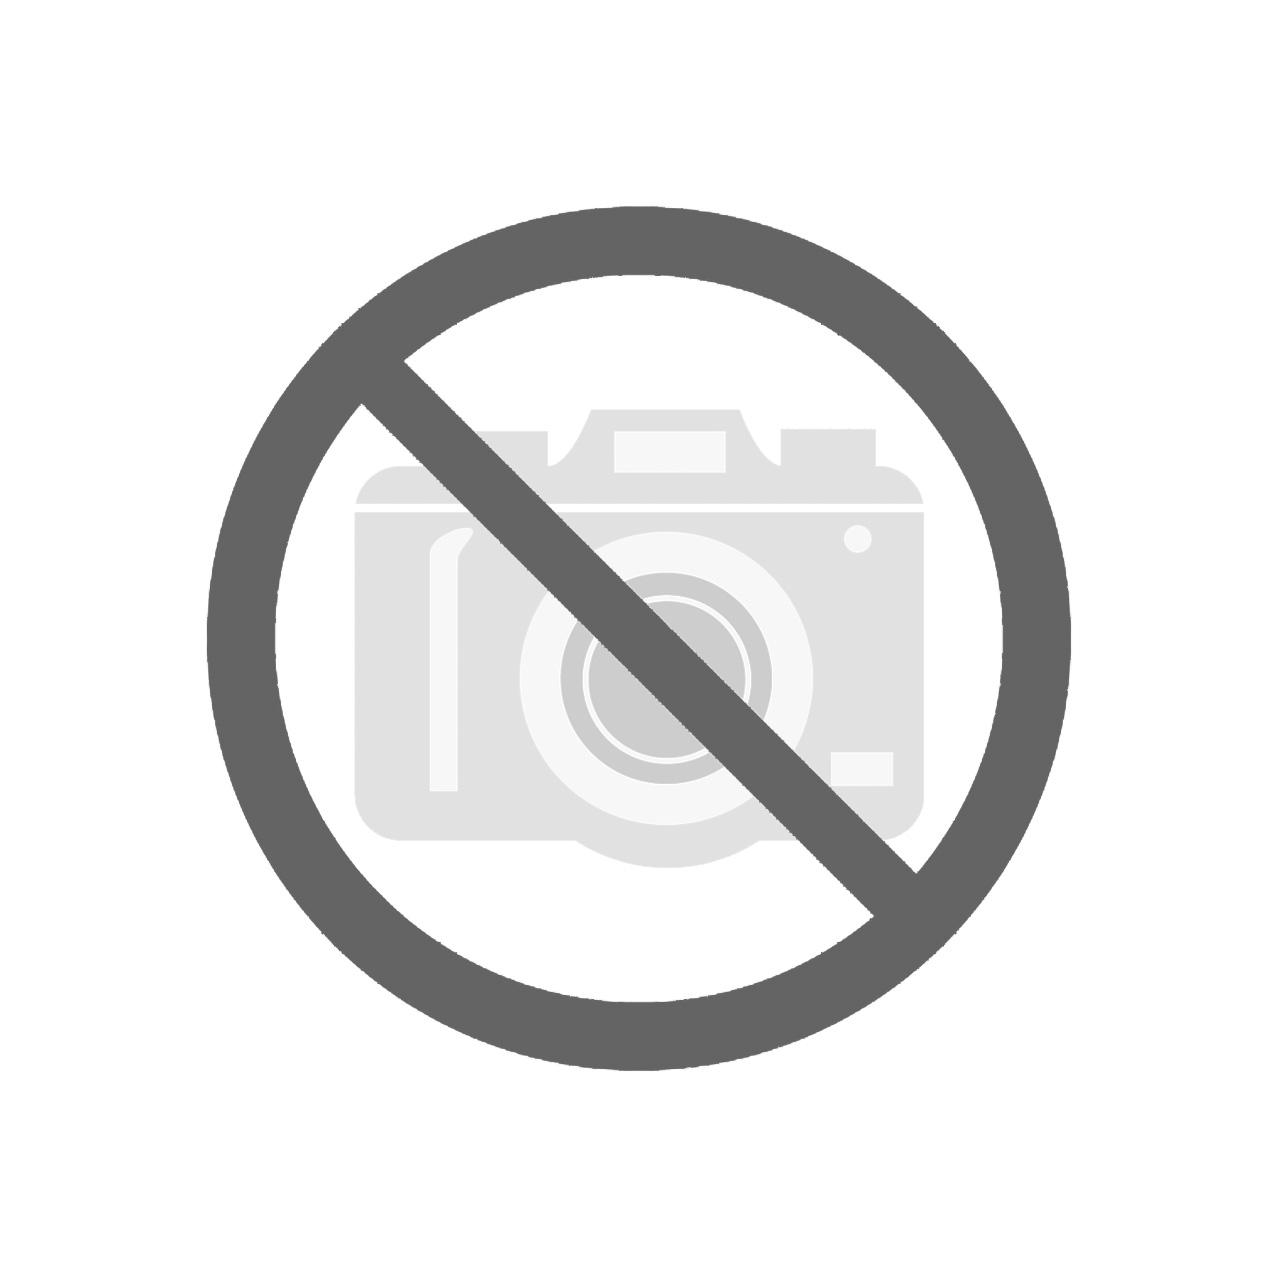 Docisk pneumatyczny do Topcut 3200 S / ER BERNARDO